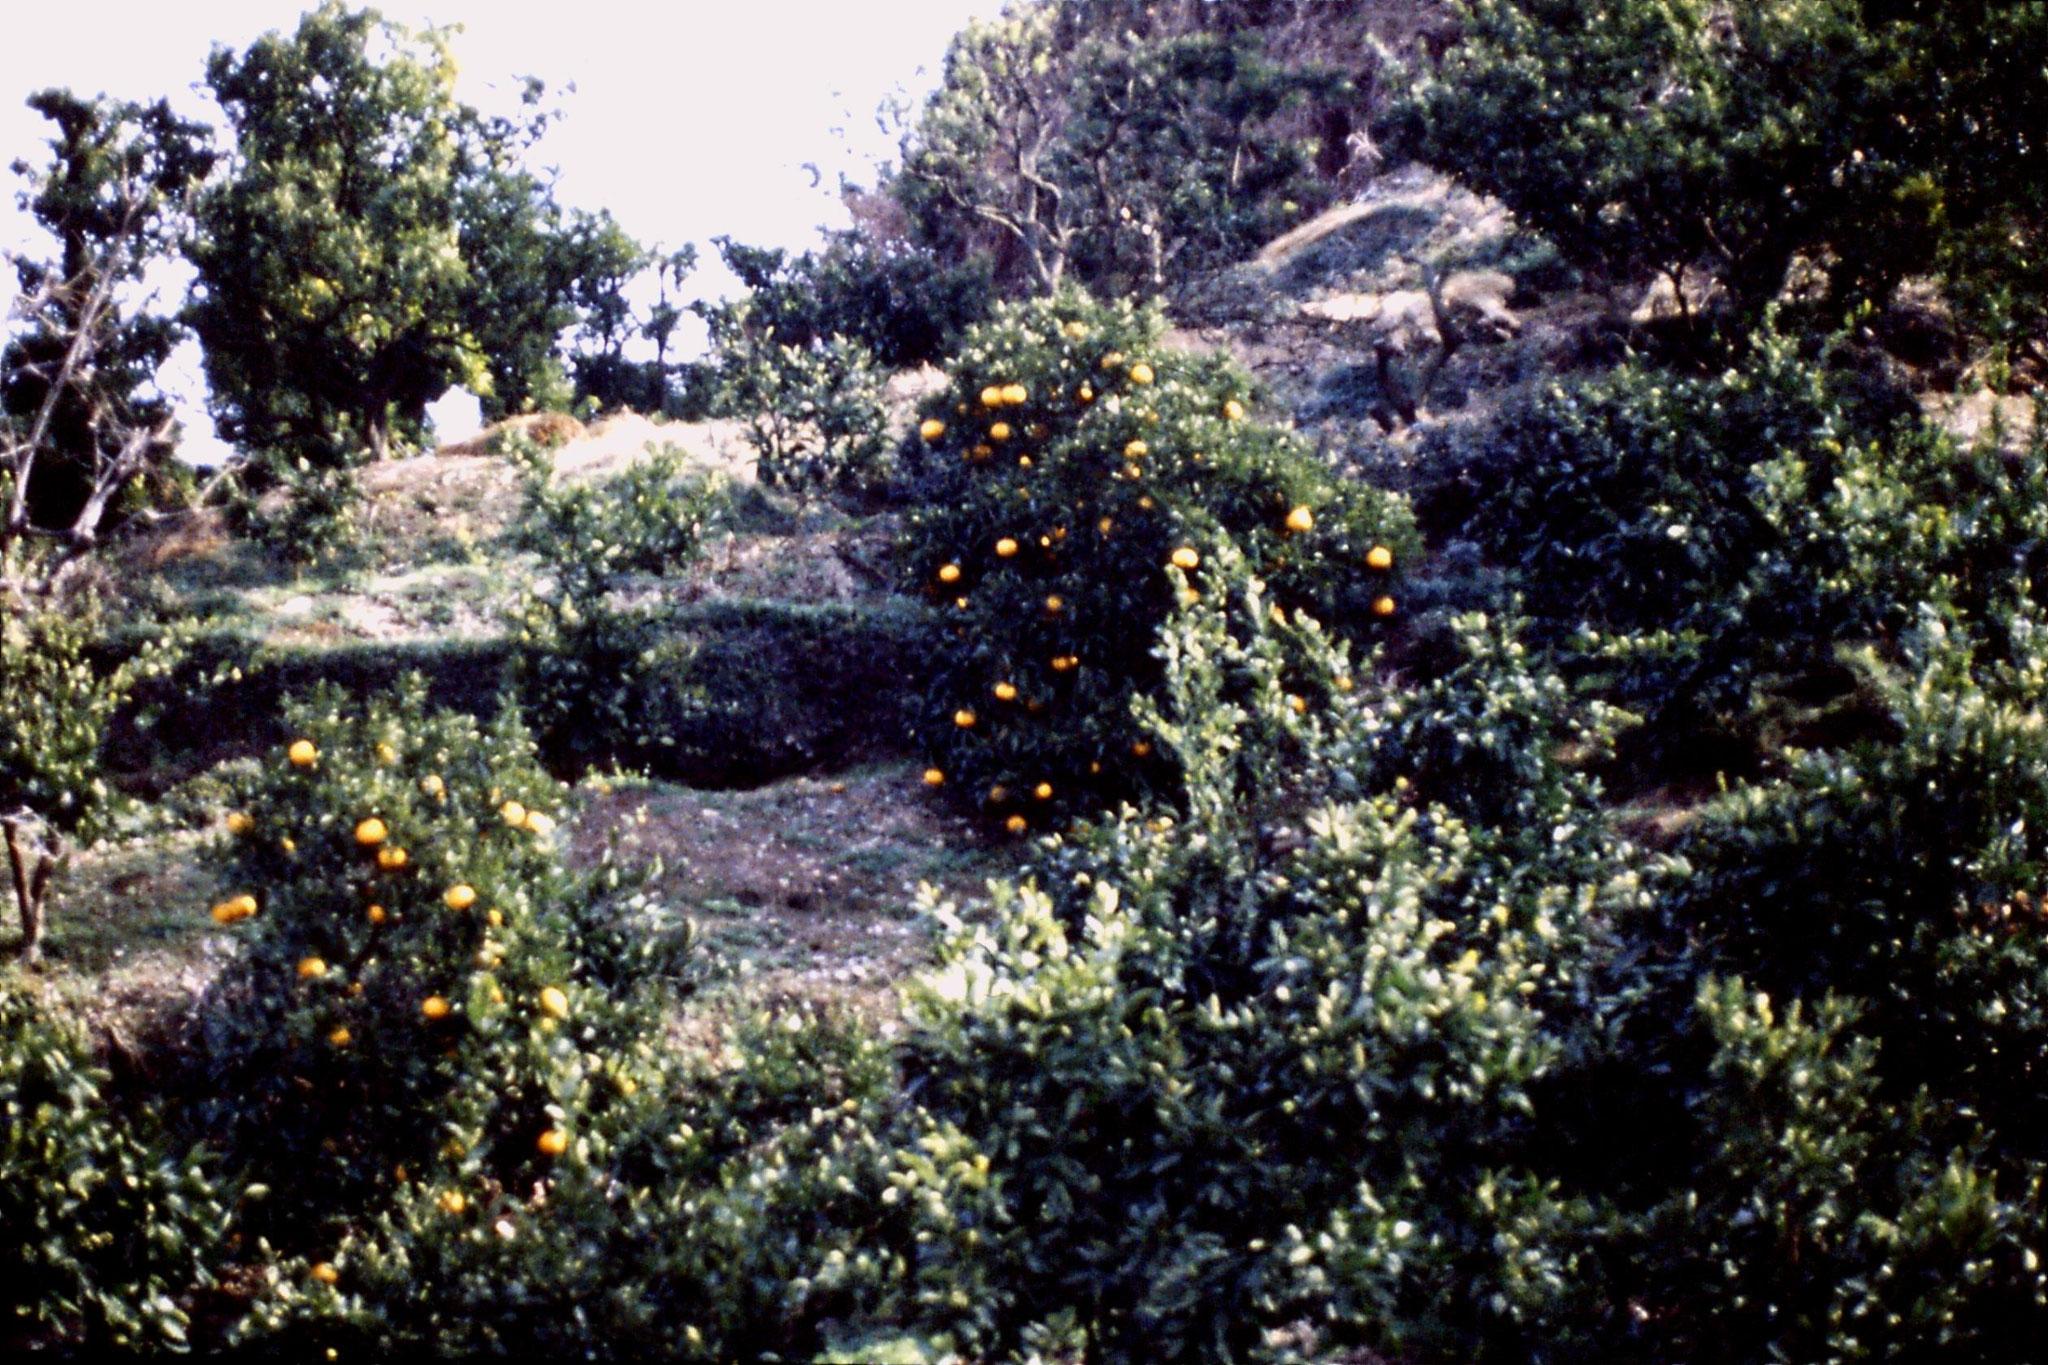 27/1/1989: 21: Shimizu mandarin orange trees